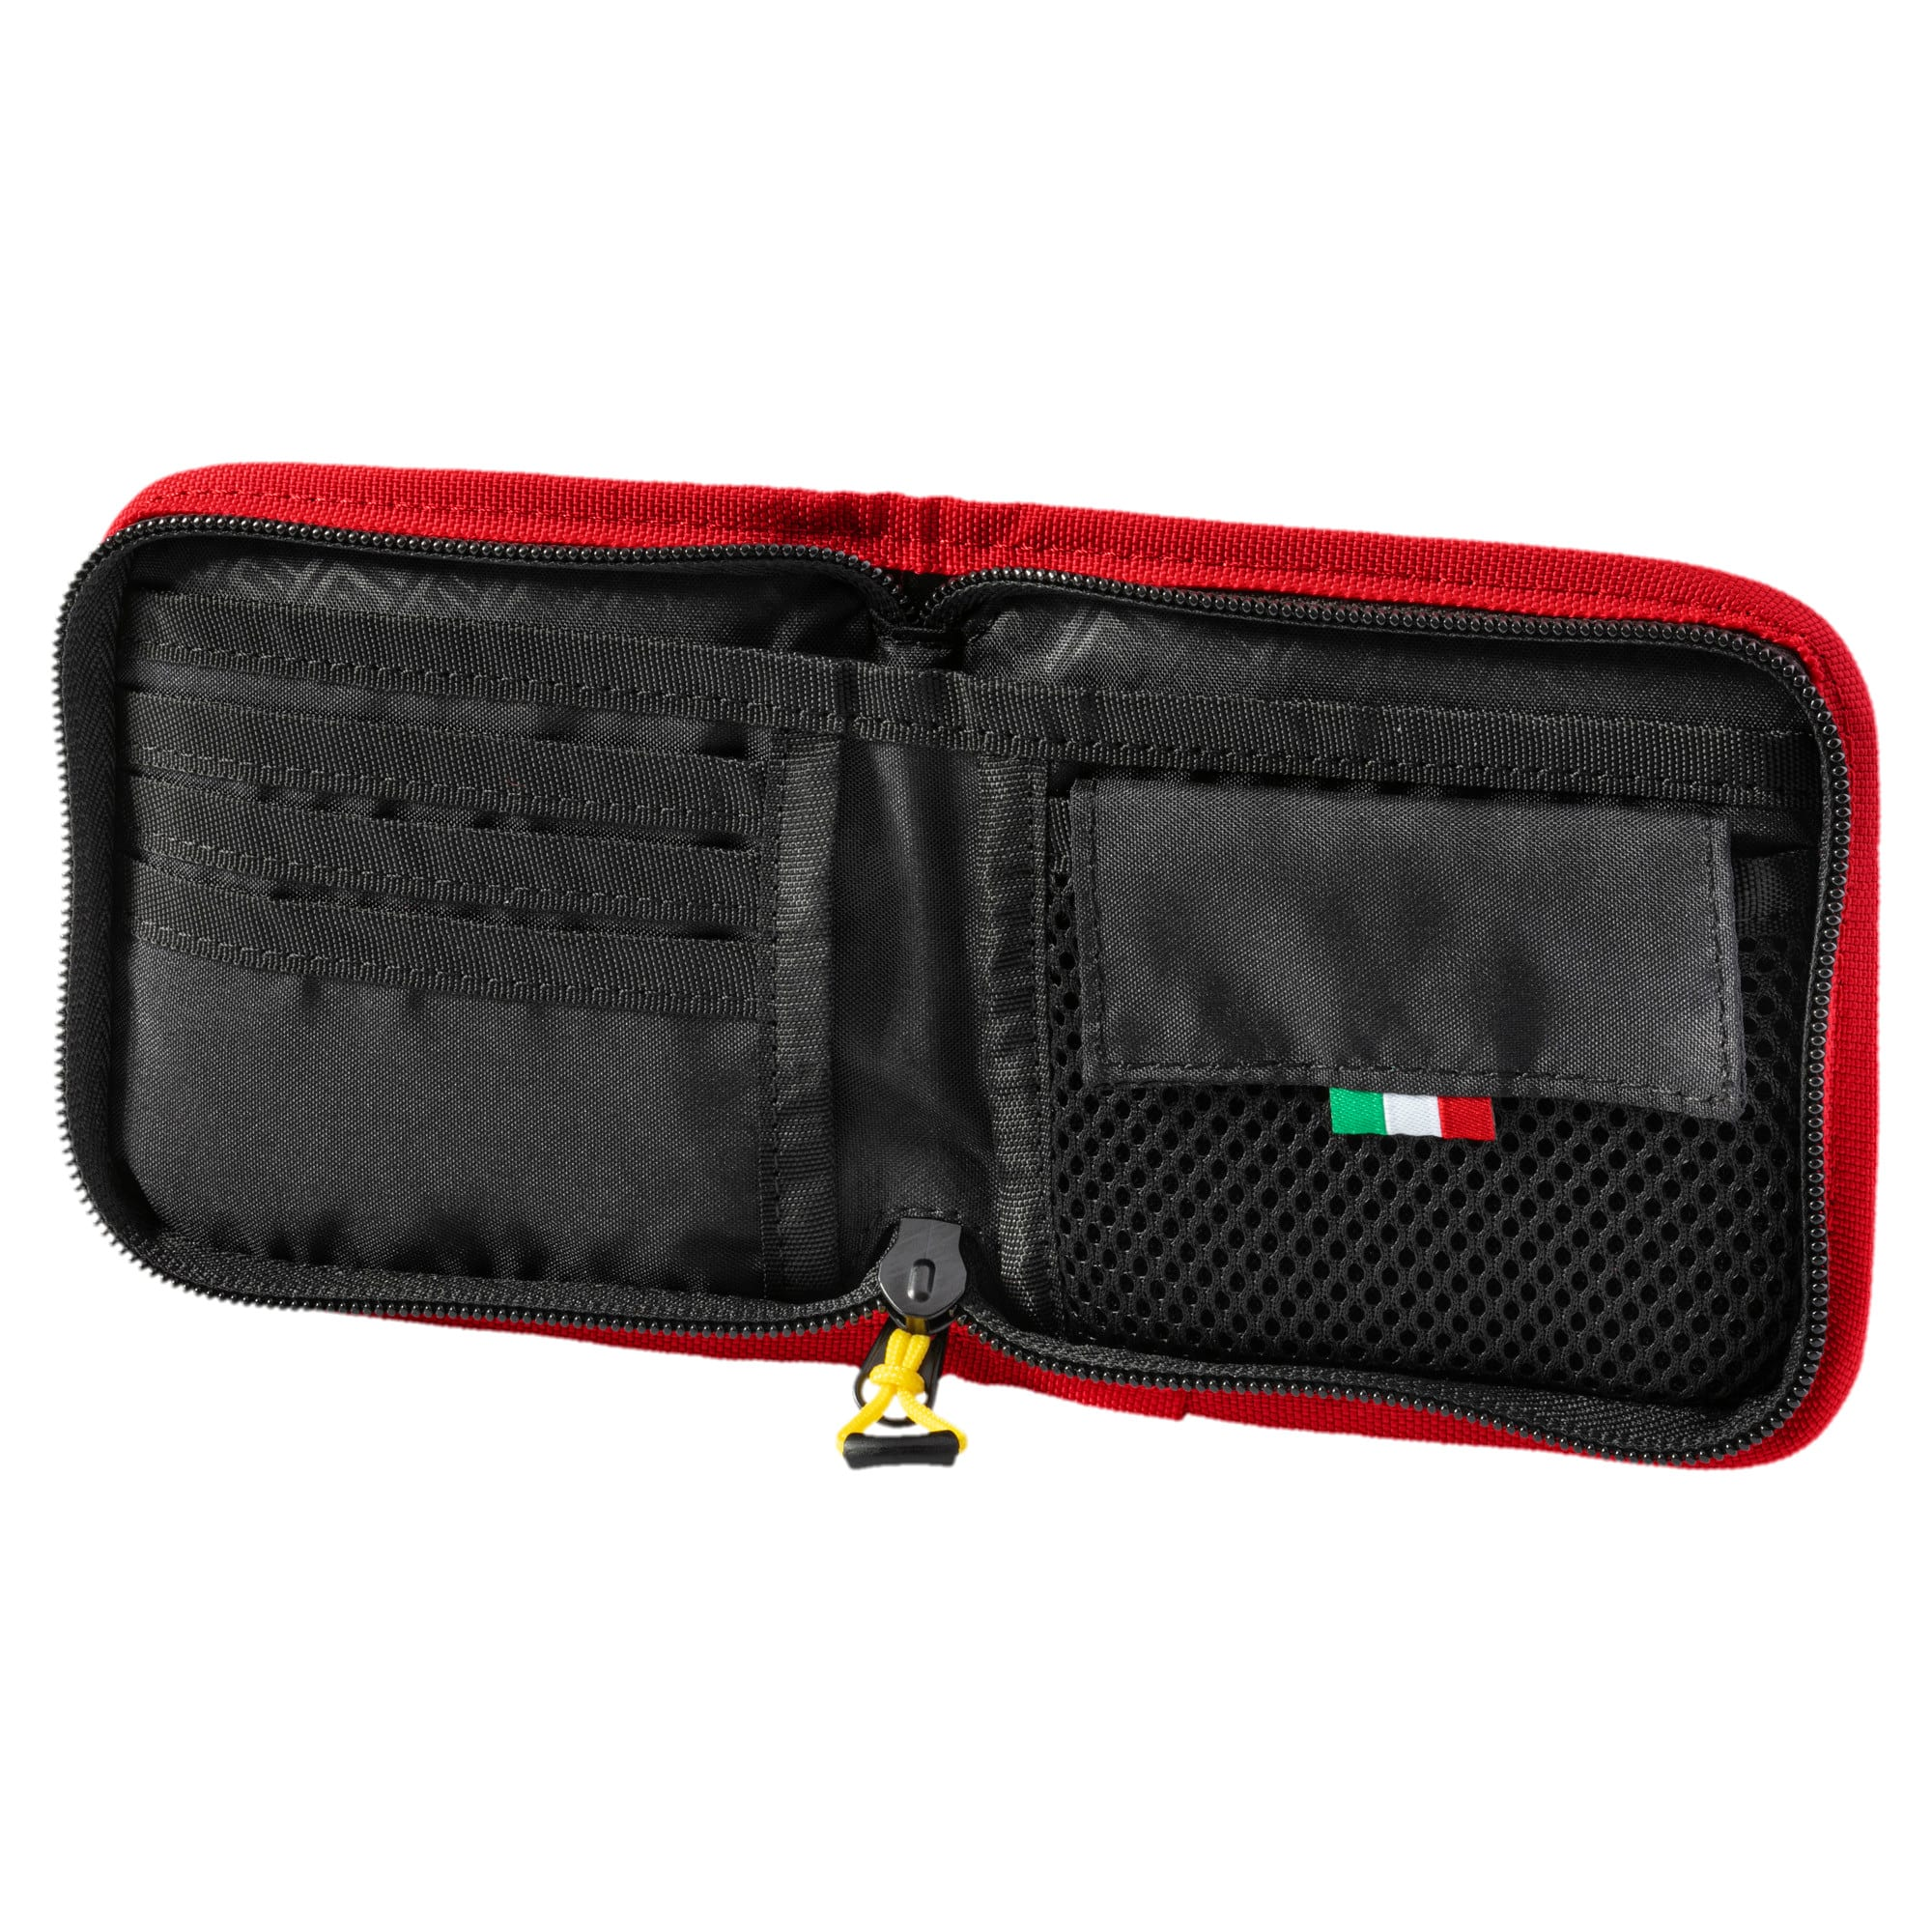 Thumbnail 3 of Ferrari Fanwear Wallet, Rosso Corsa, medium-IND